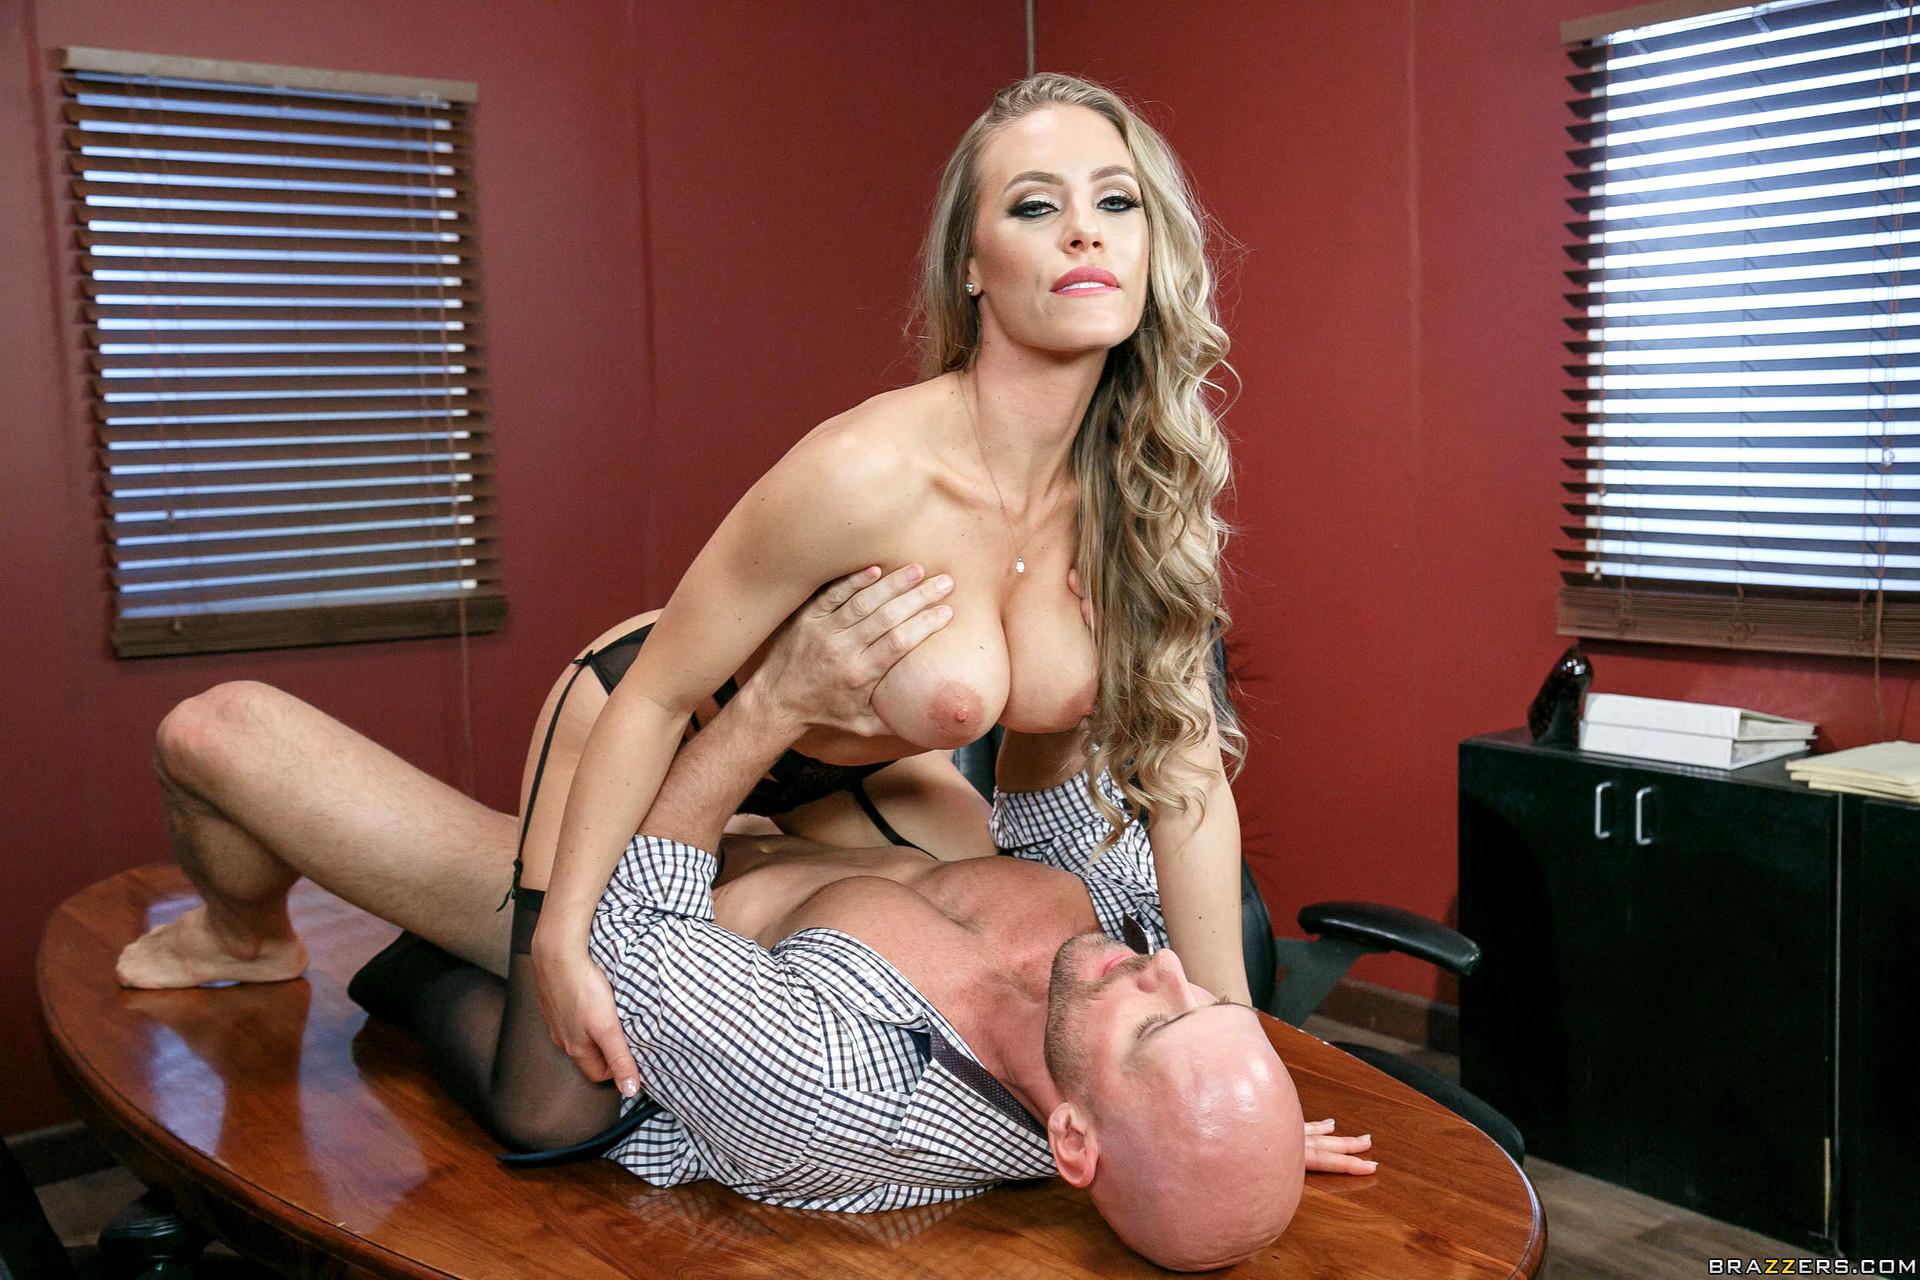 Big tits at work nude